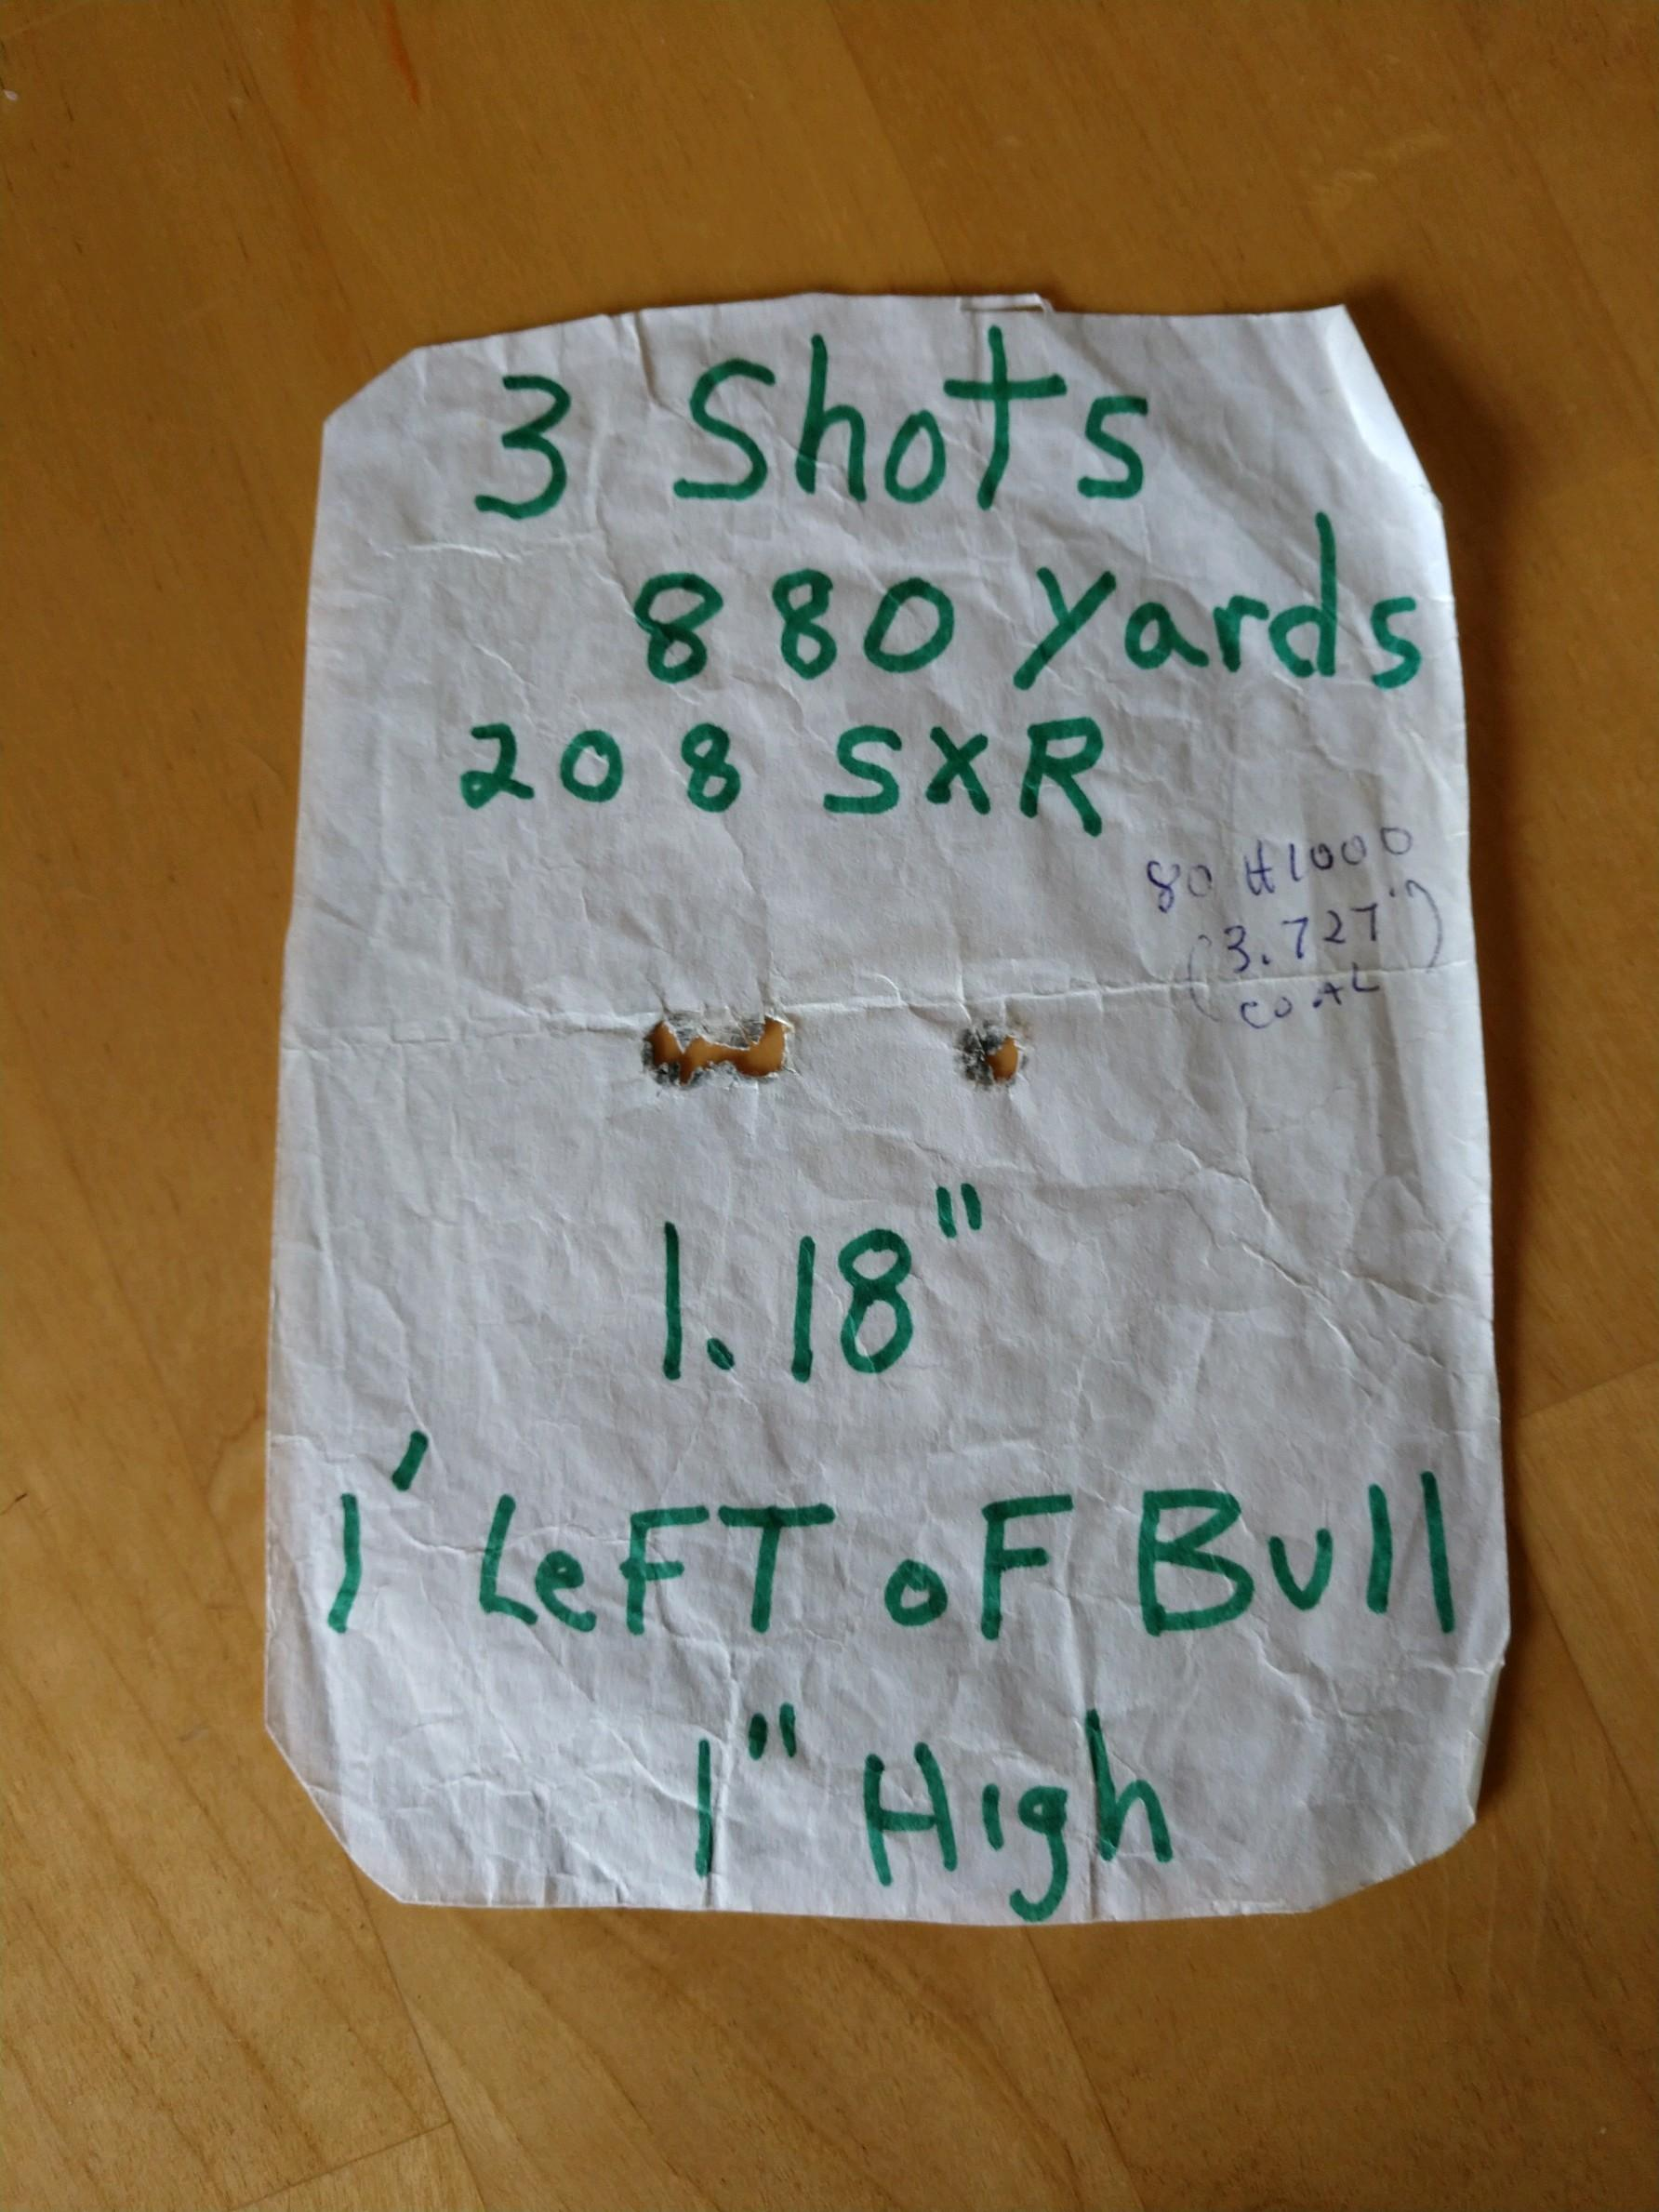 30'375 S.I. 208 SXR @ 880 yards.jpg